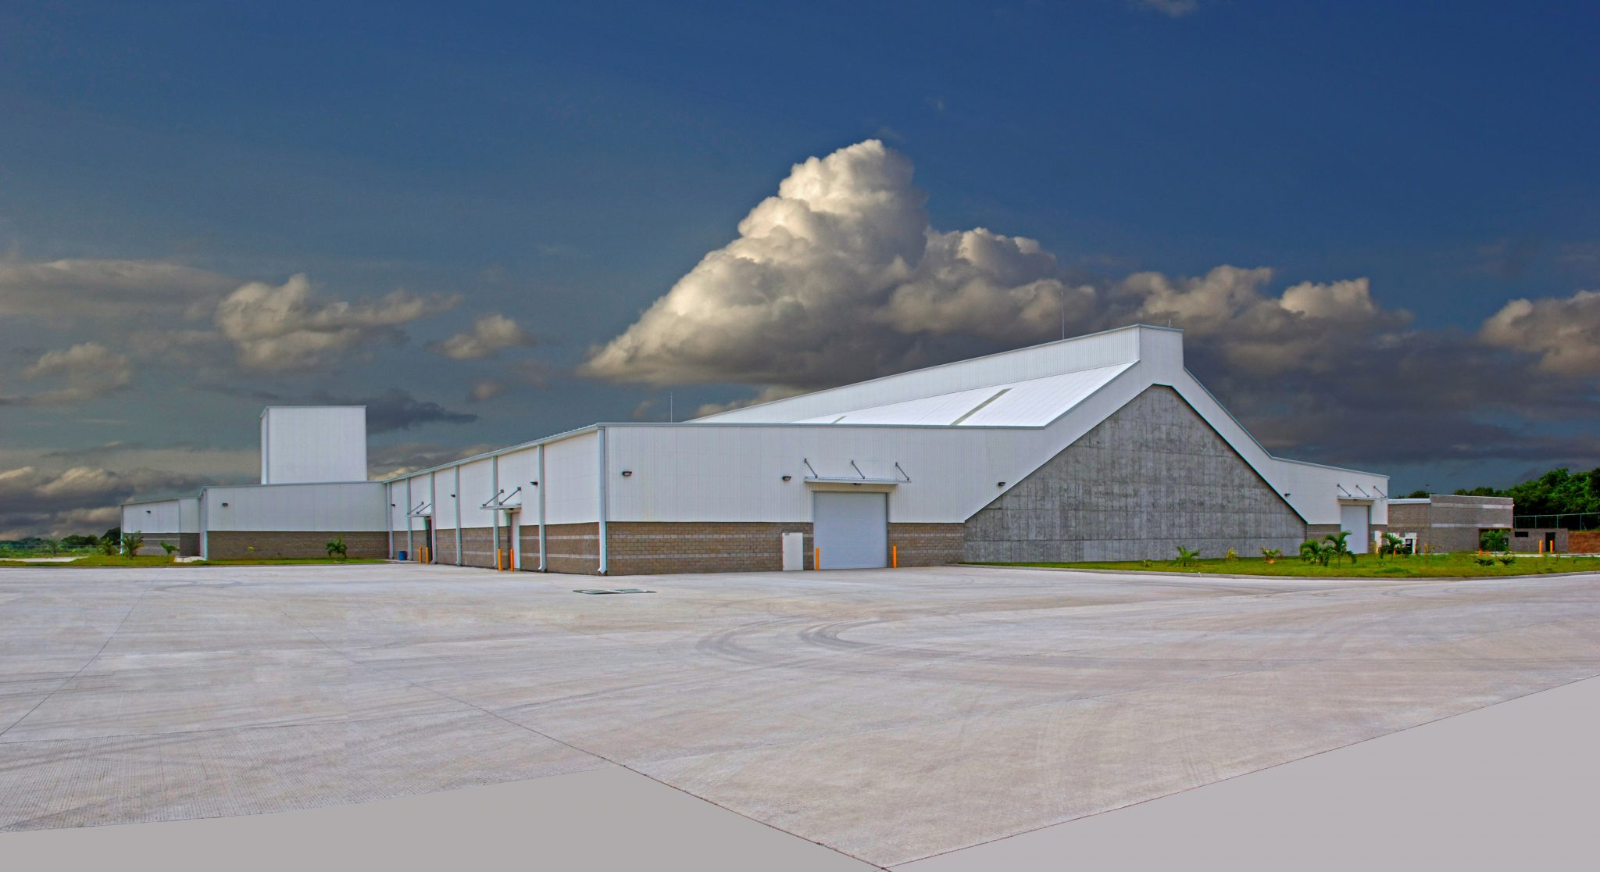 Omagro's mixed-batch facility and warehouse in Veracruz.